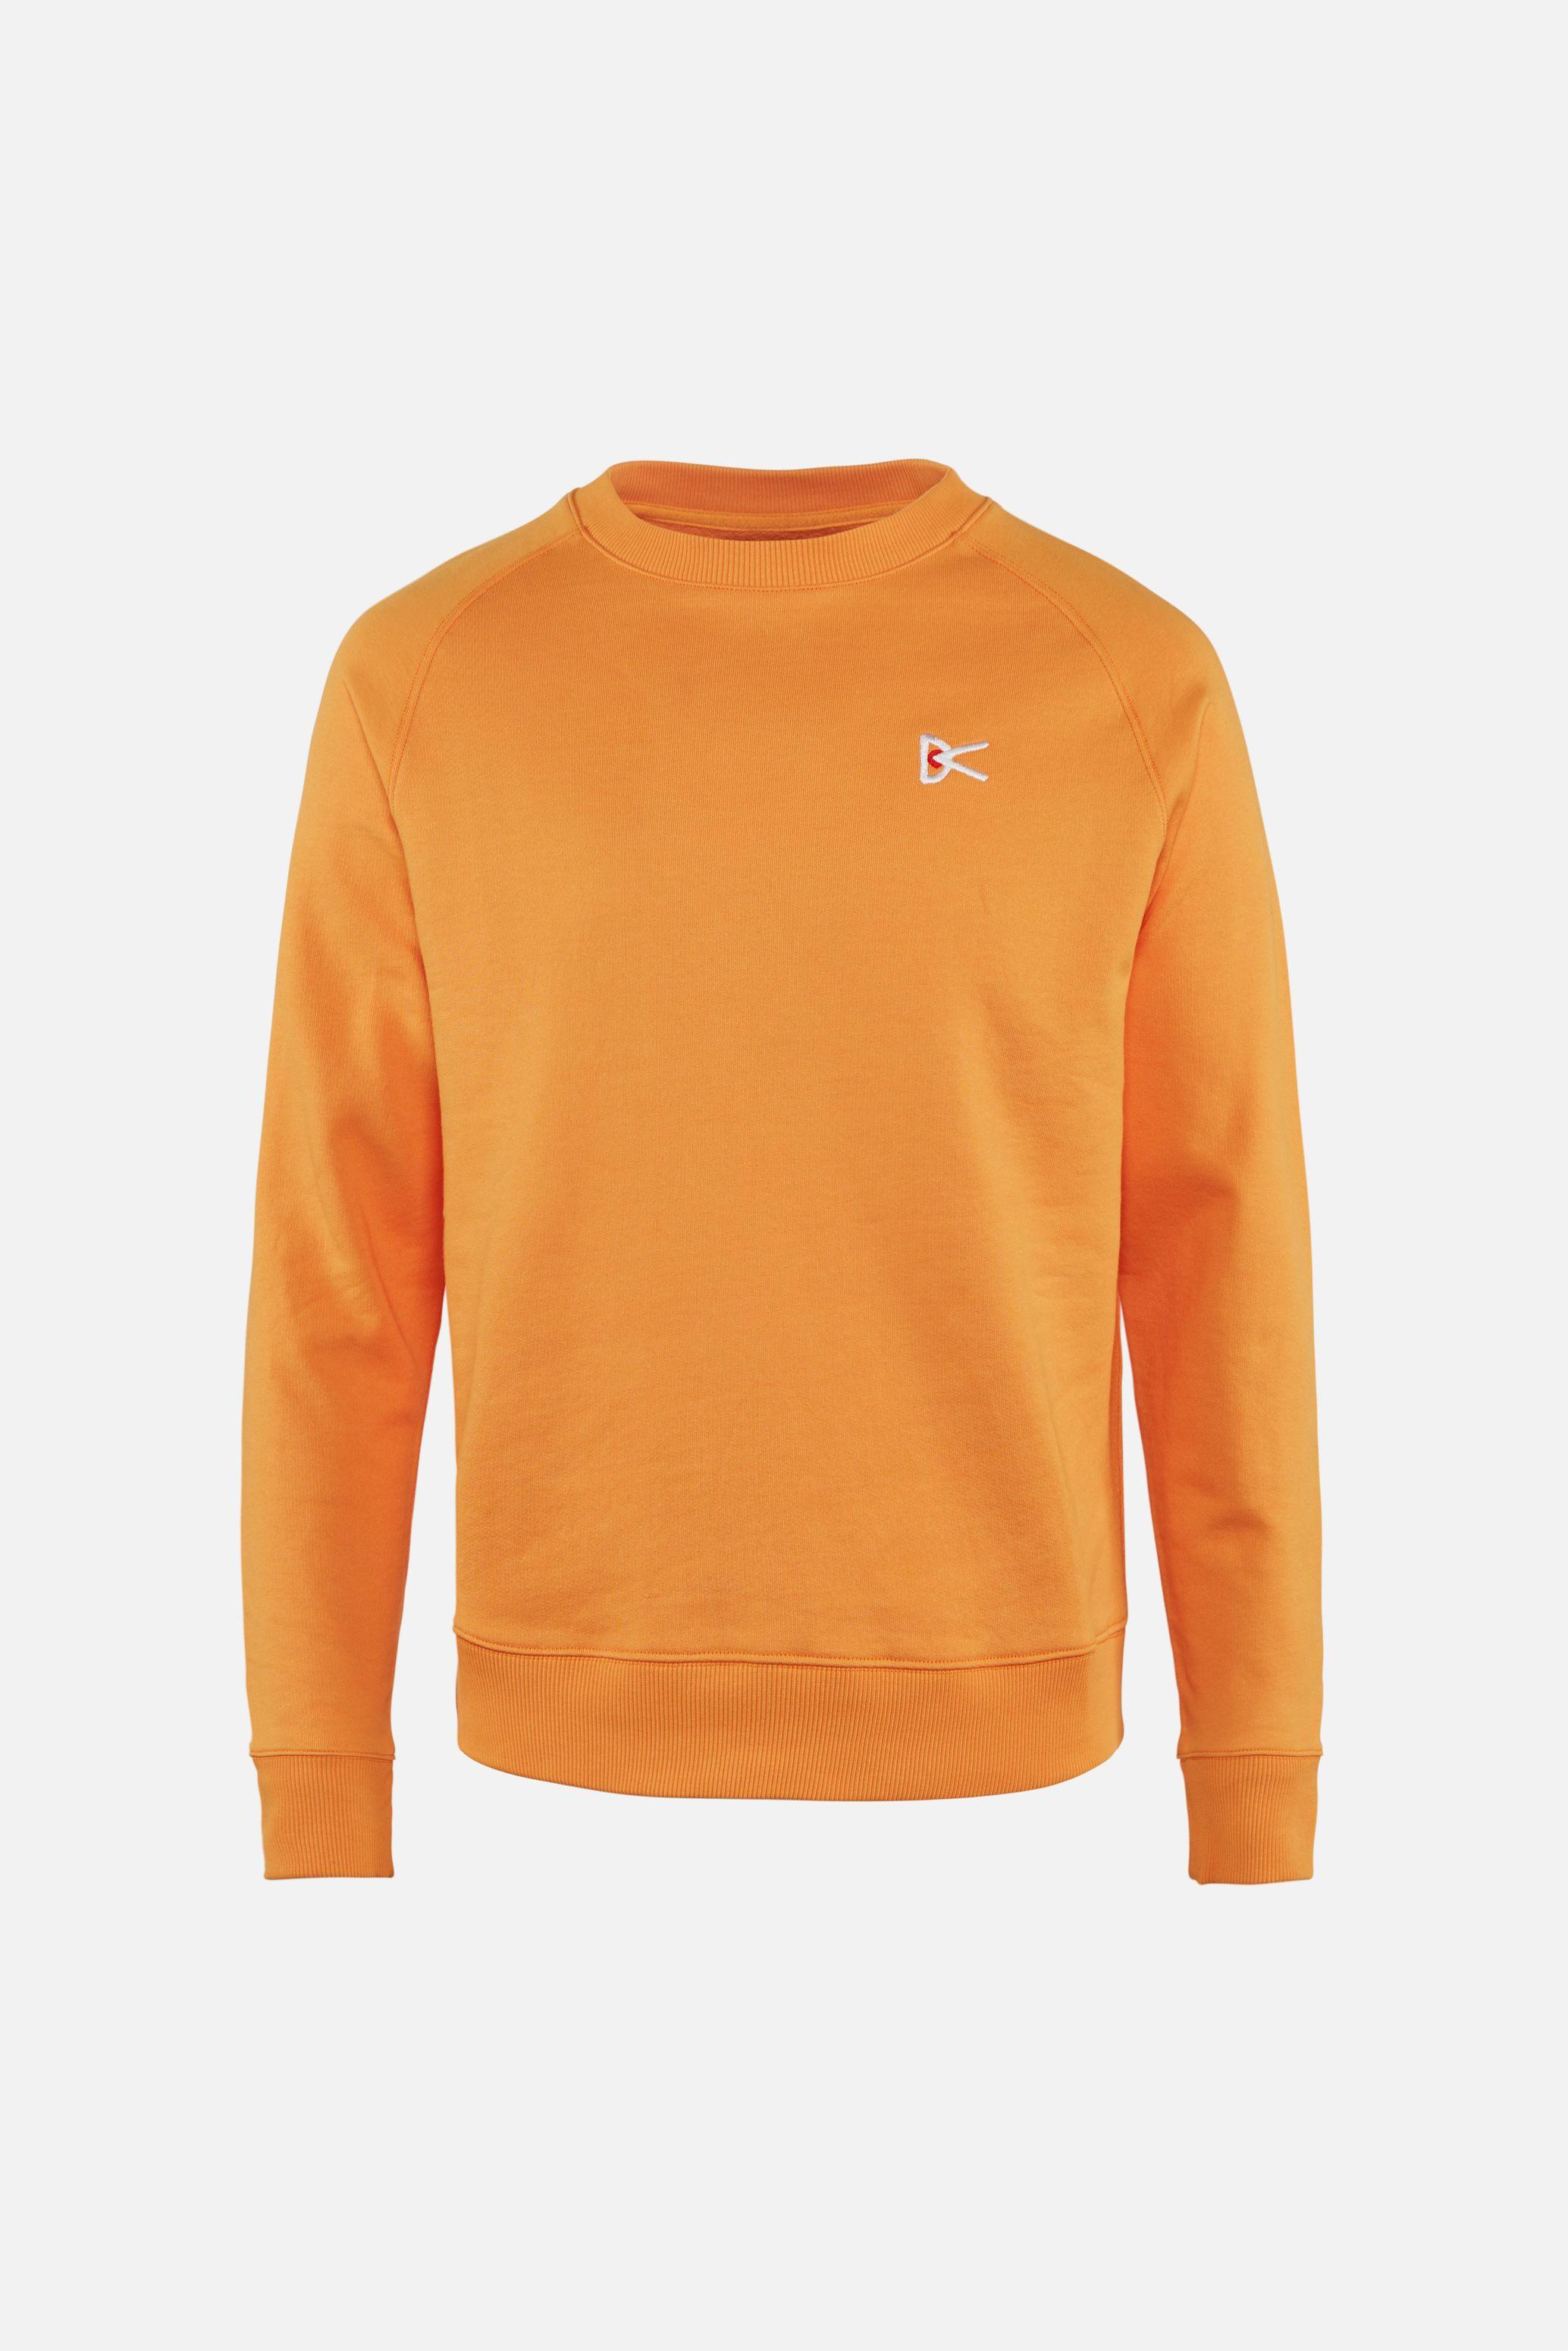 Sati Crew Neck Sweatshirt, Burn